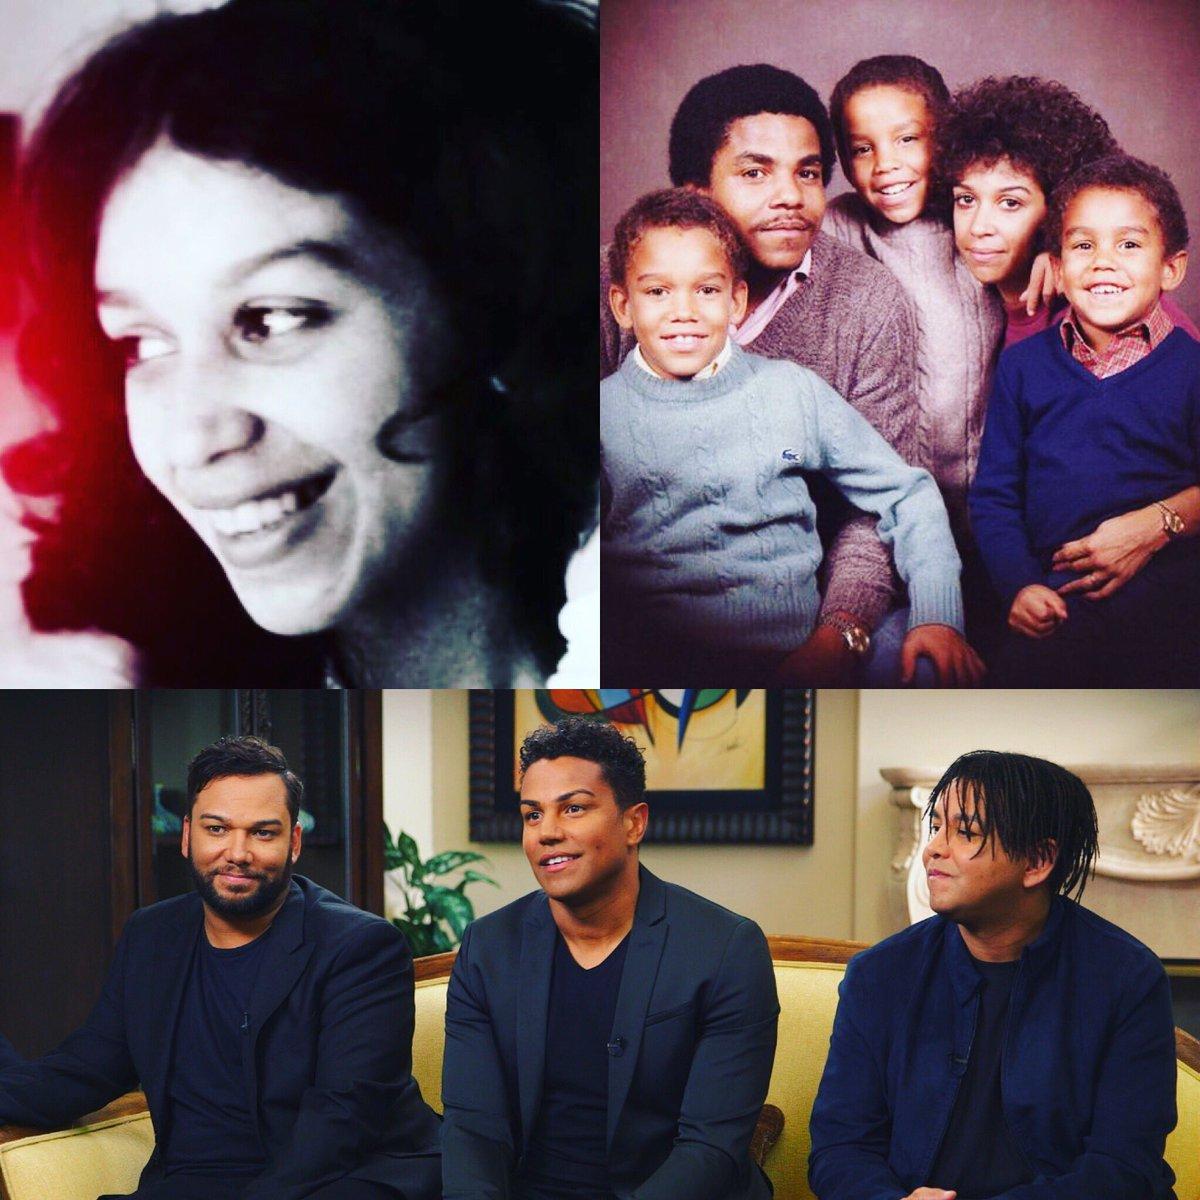 Tonight on @ABC2020 #deedeejackson #loss #grief #domesticviolence #murder #ddjf<br>http://pic.twitter.com/vfqngWFB77